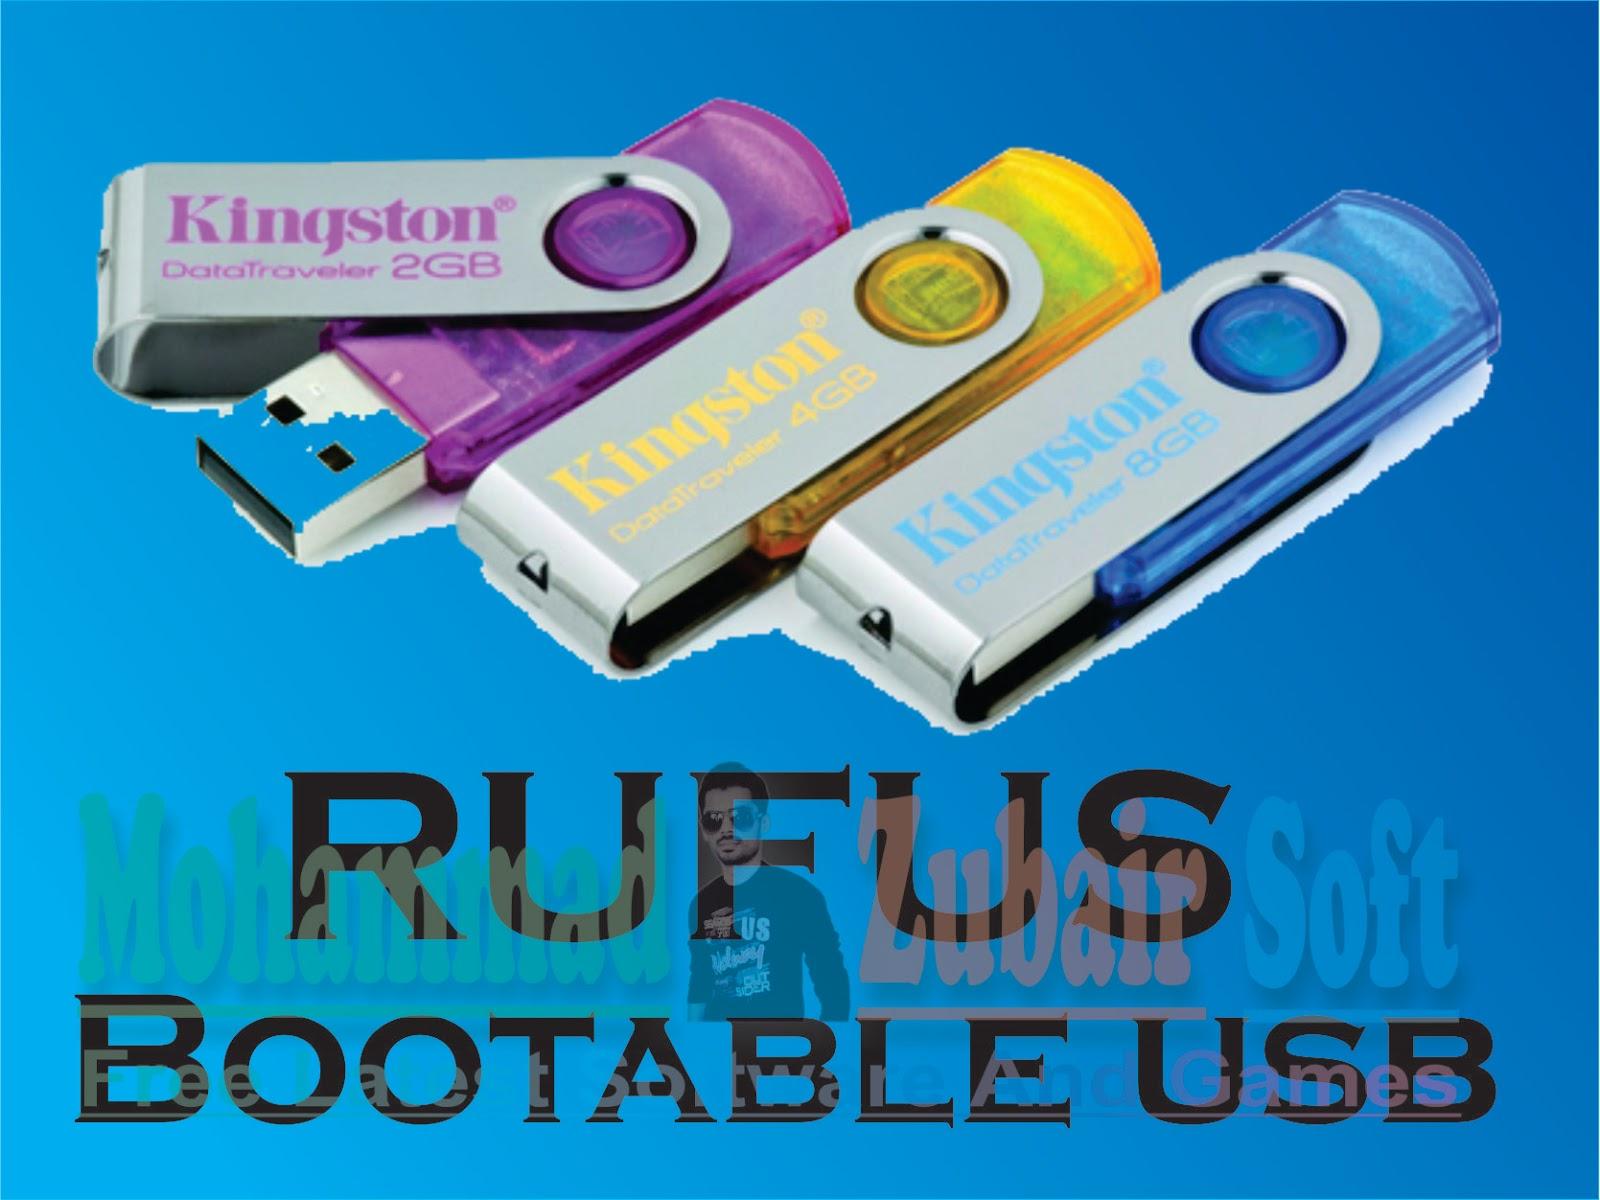 rufus windows 7 bootable usb download